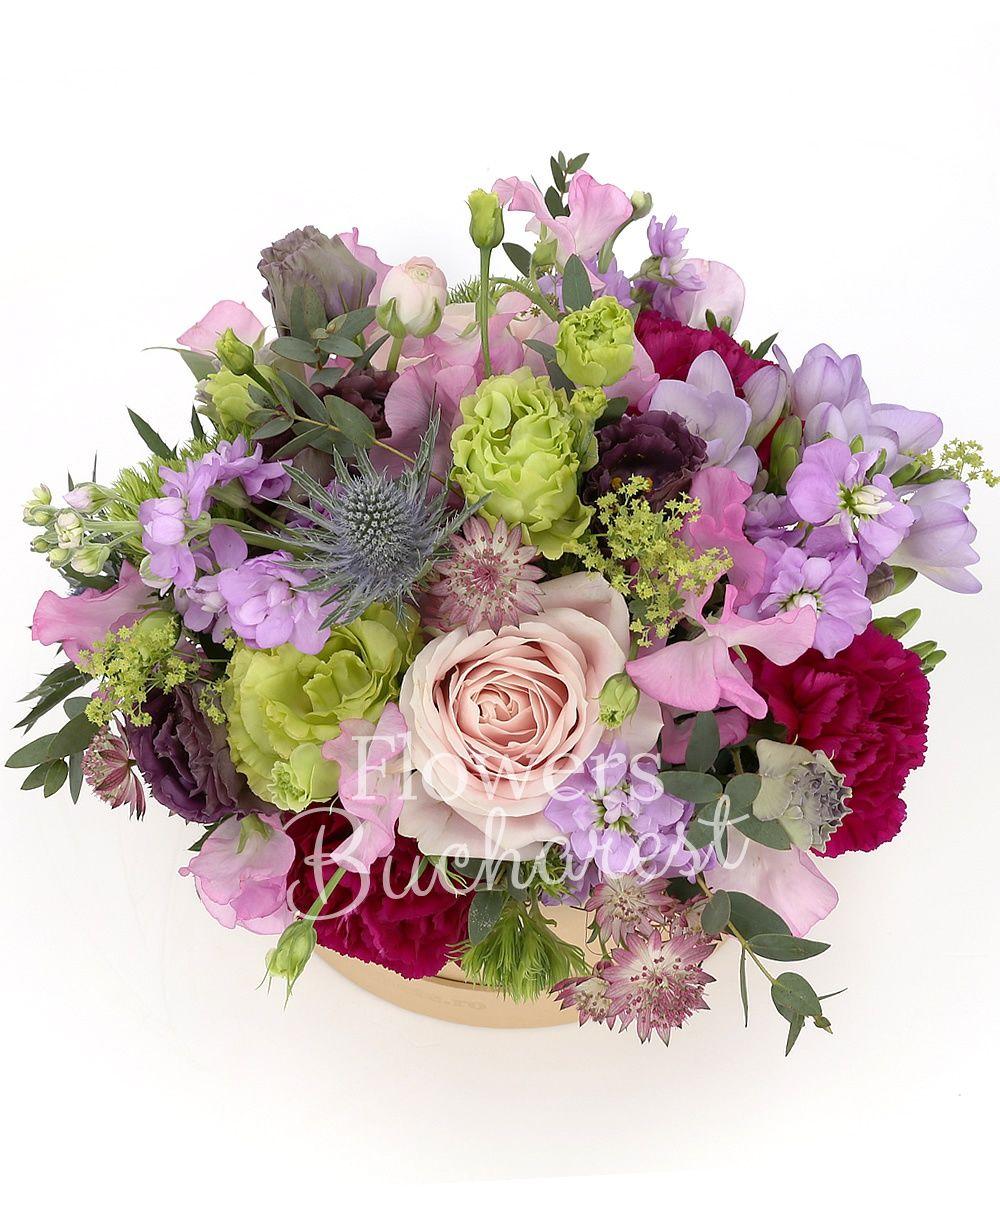 3 green lisianthus, 5 mauve matthiola, 3 pink roses, 3 green dianthus, 2 eryngium, 5 astranția, 5 cyclam carnations, 3 pink lisianthus, greenery